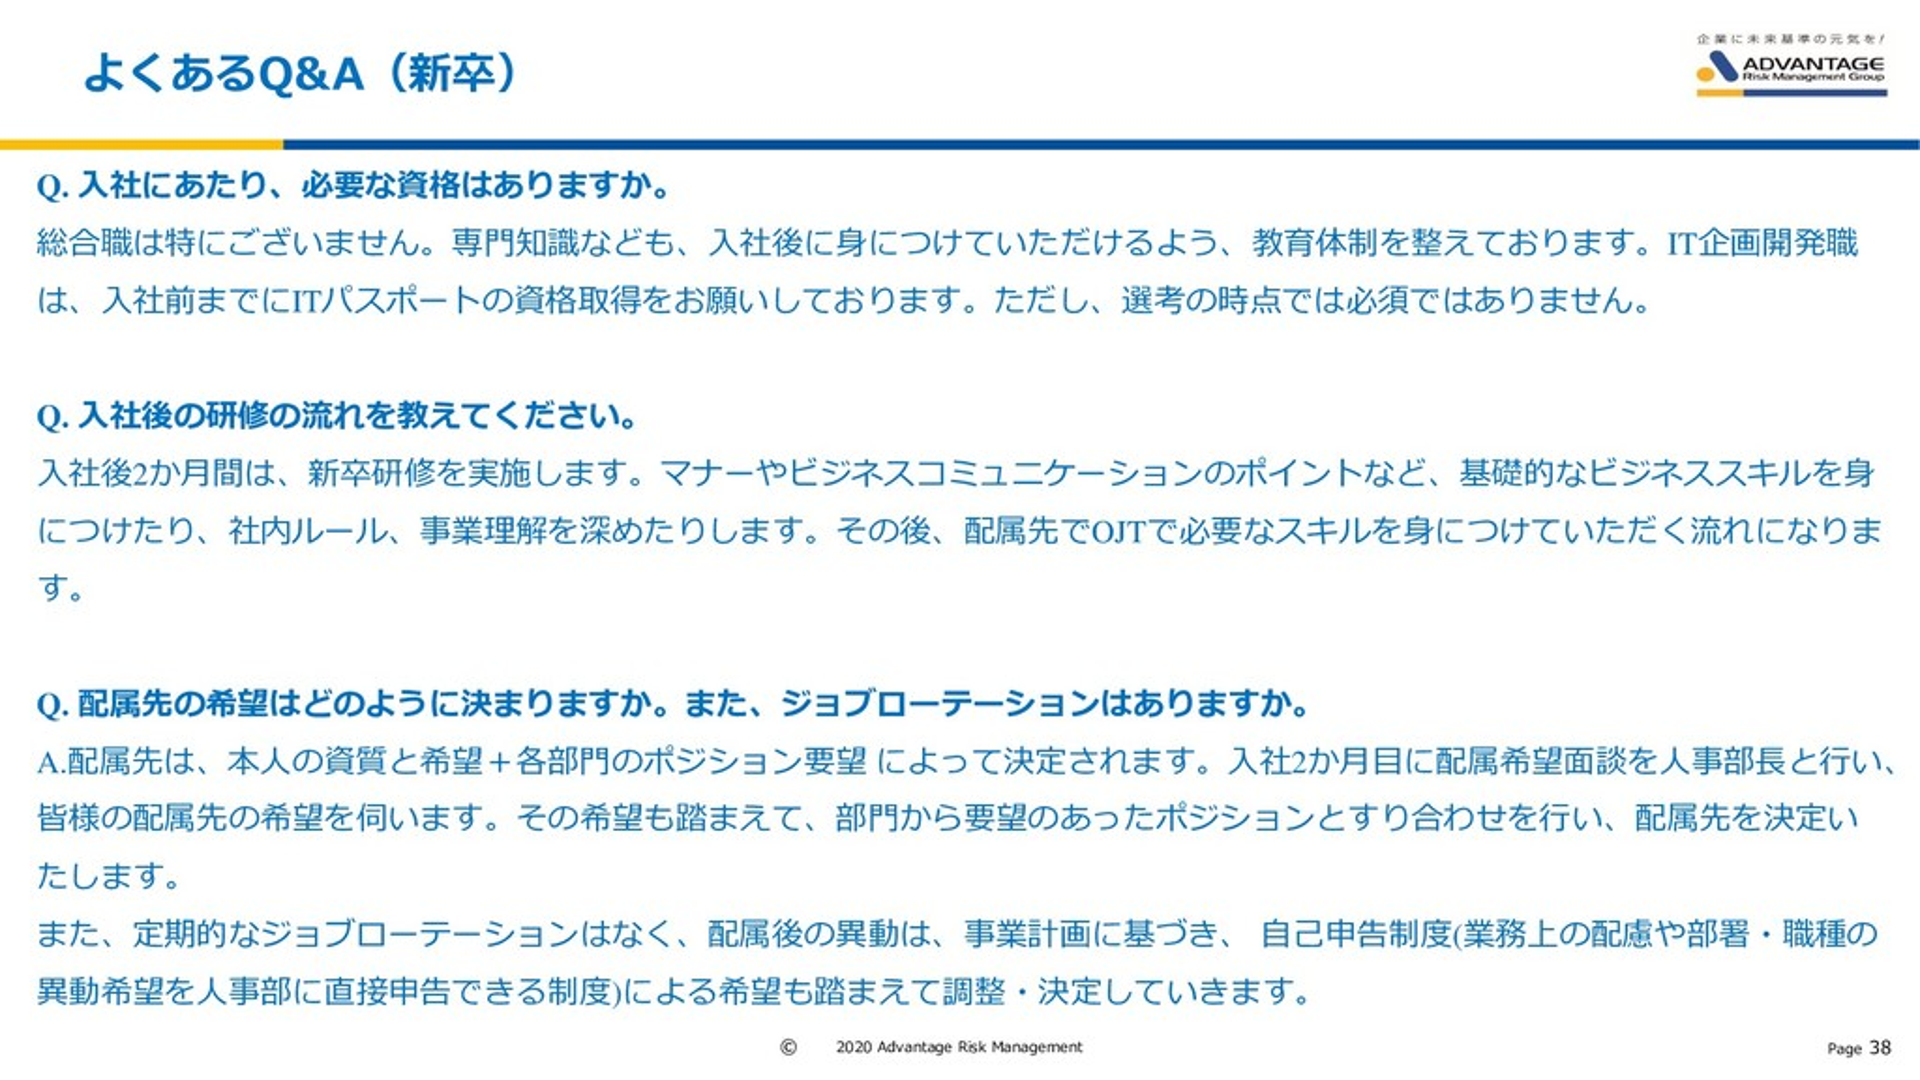 Page 38 2020 Advantage Risk Management © よくあるQ&...